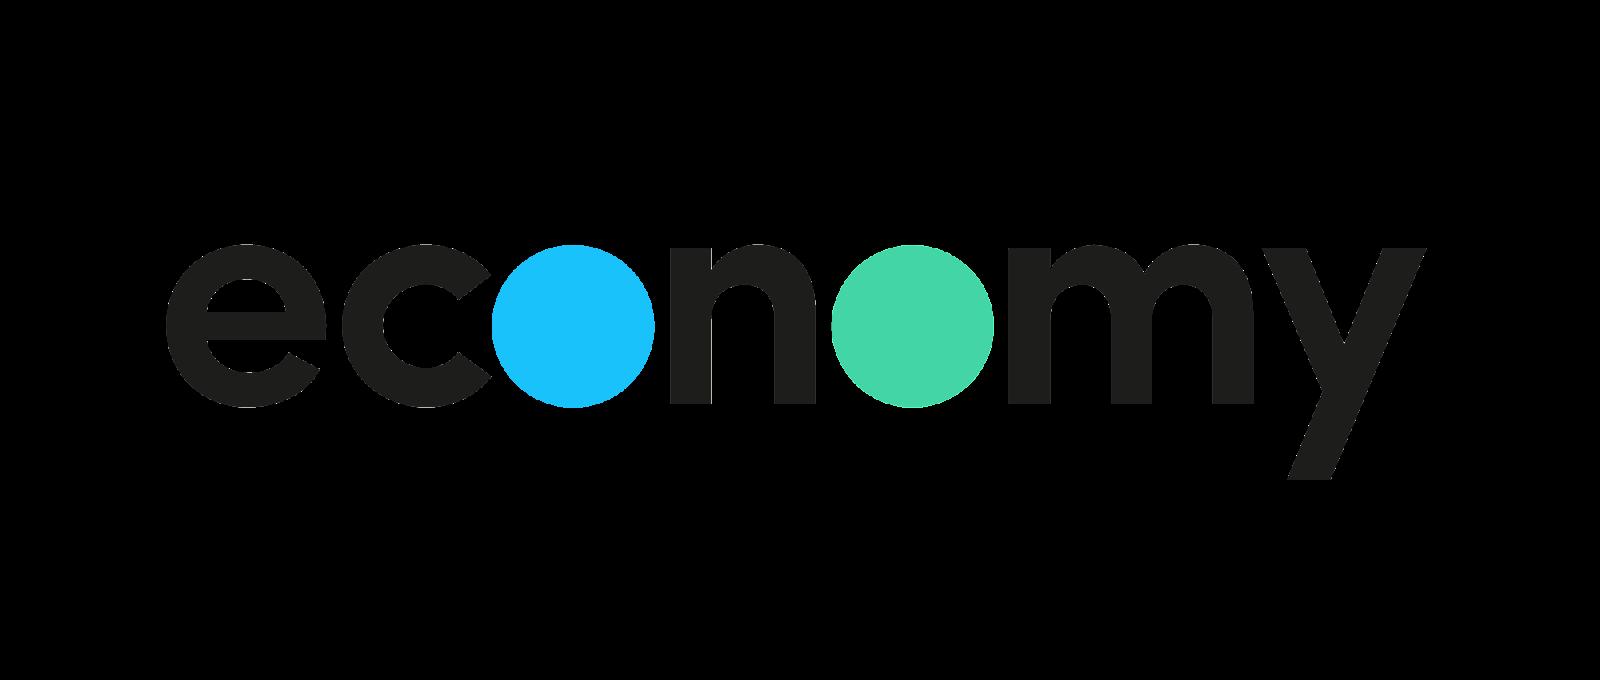 Copy of economy-logo-dark.png